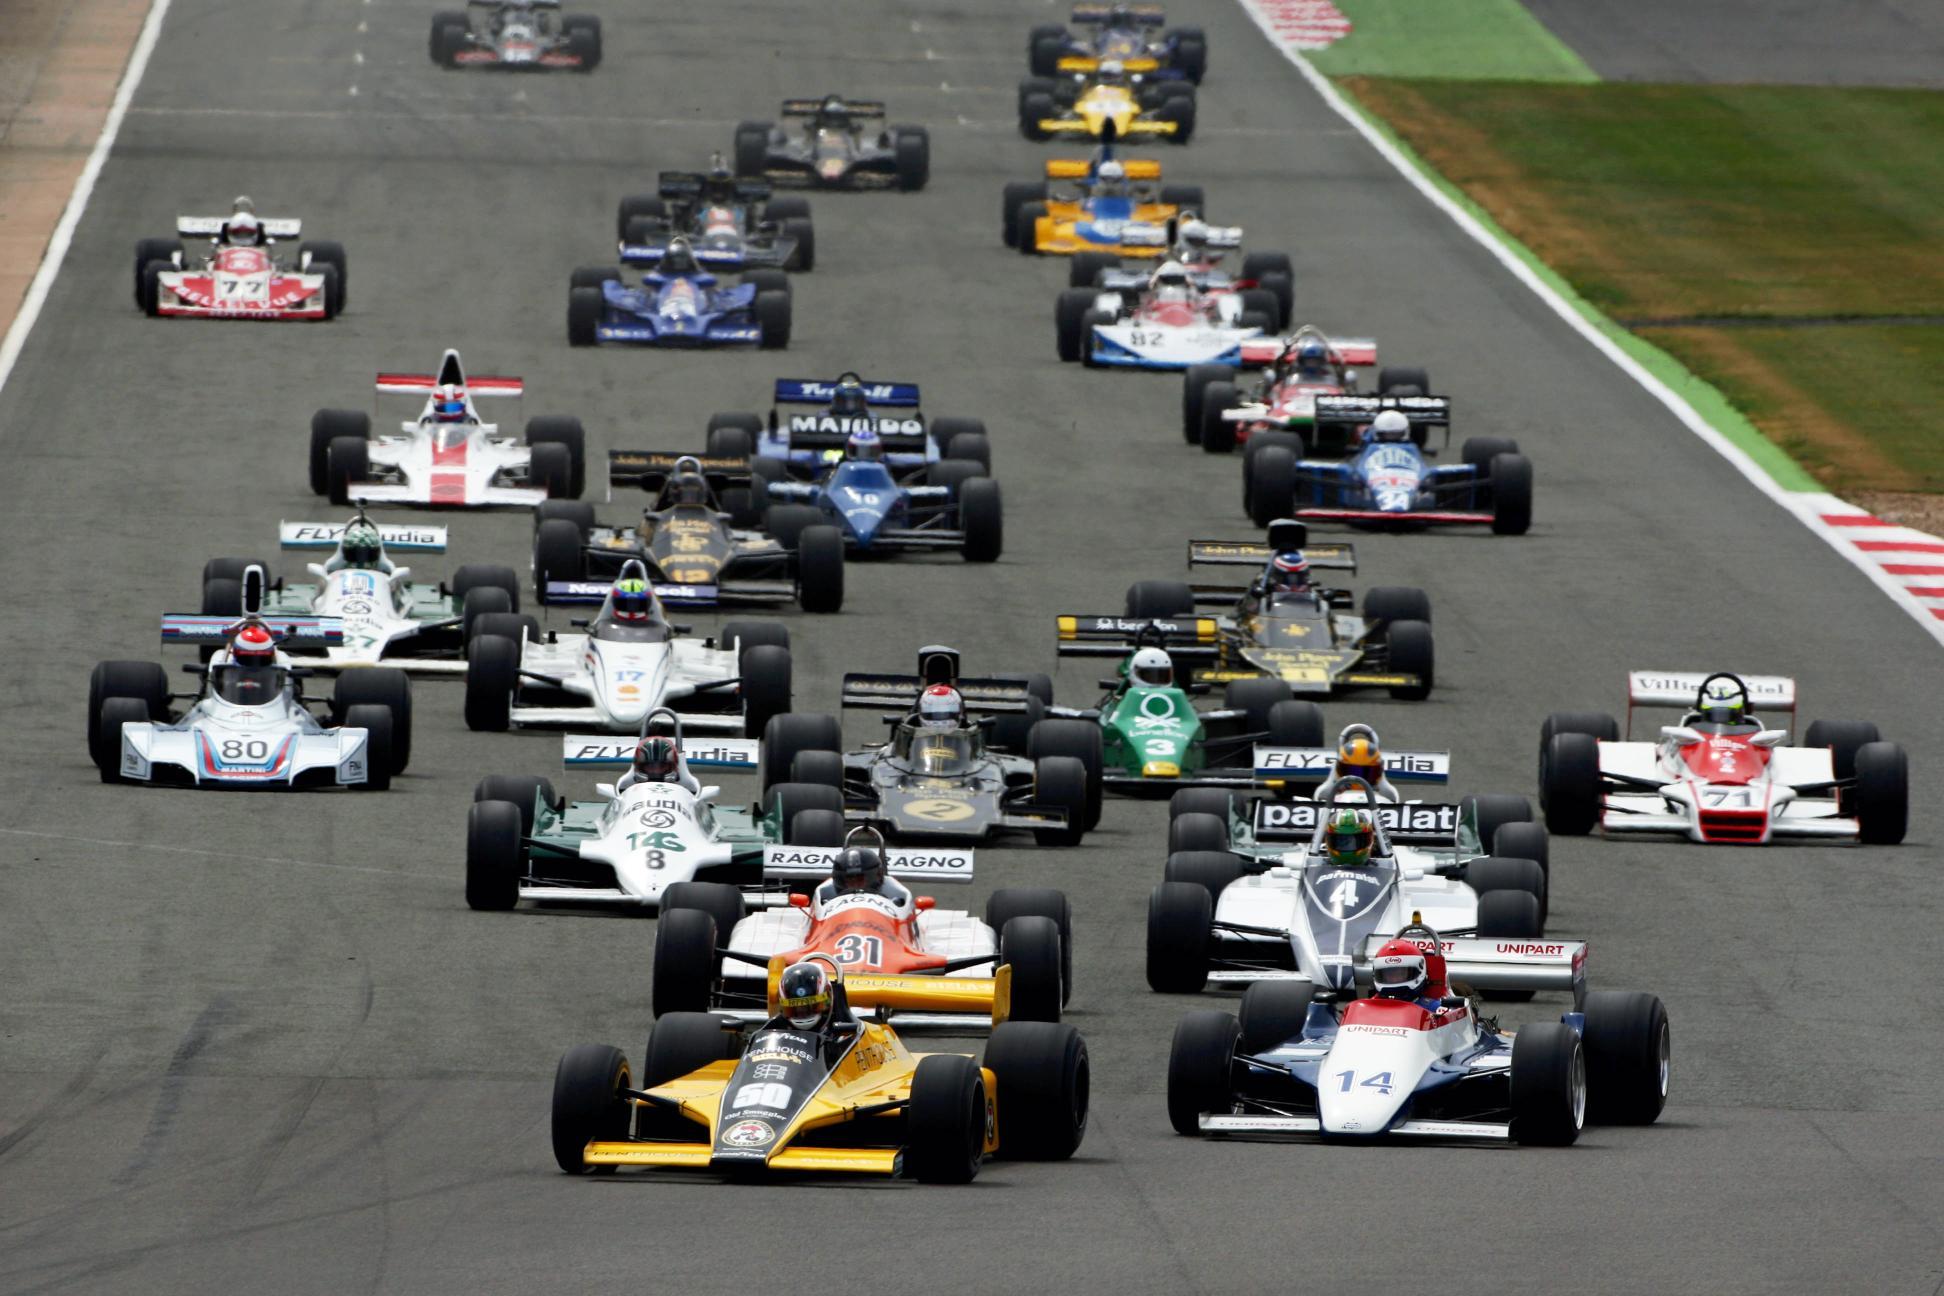 Classic Grids star at Autosport International - Auto Addicts